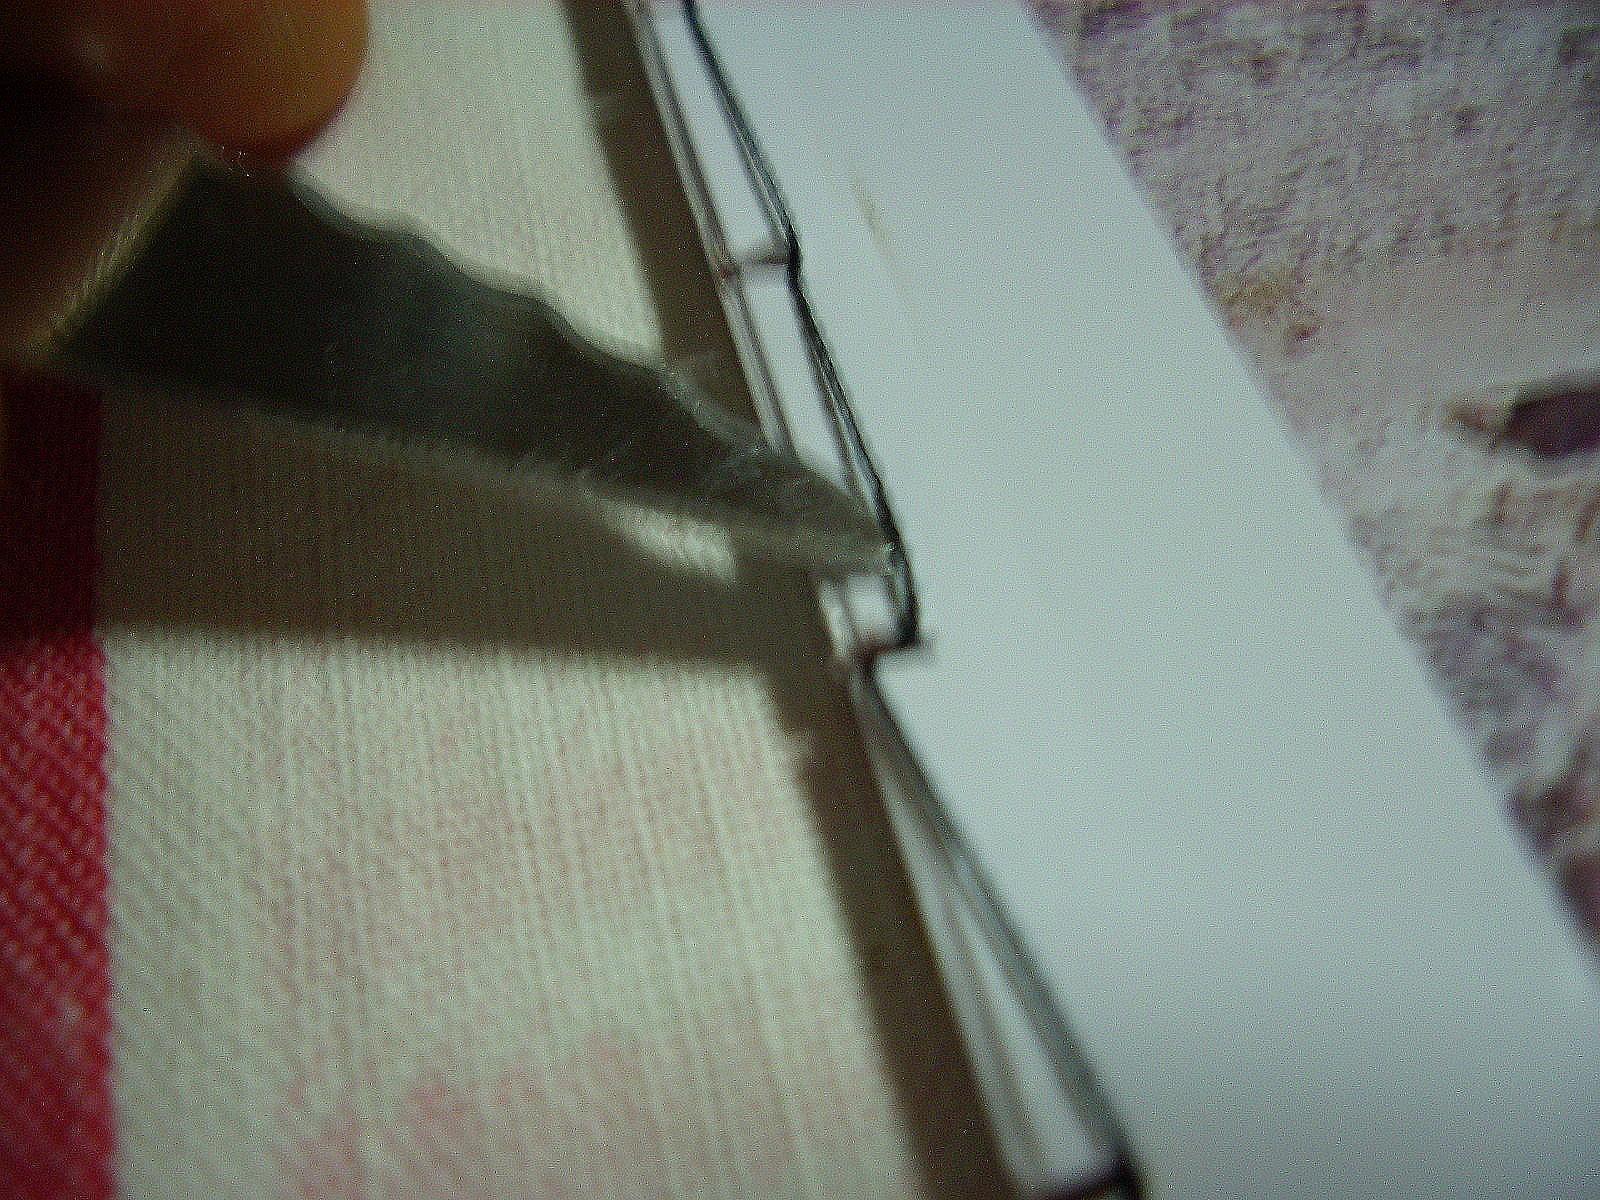 Picture of Correcting Mistakes (Corrigiendo Errores)